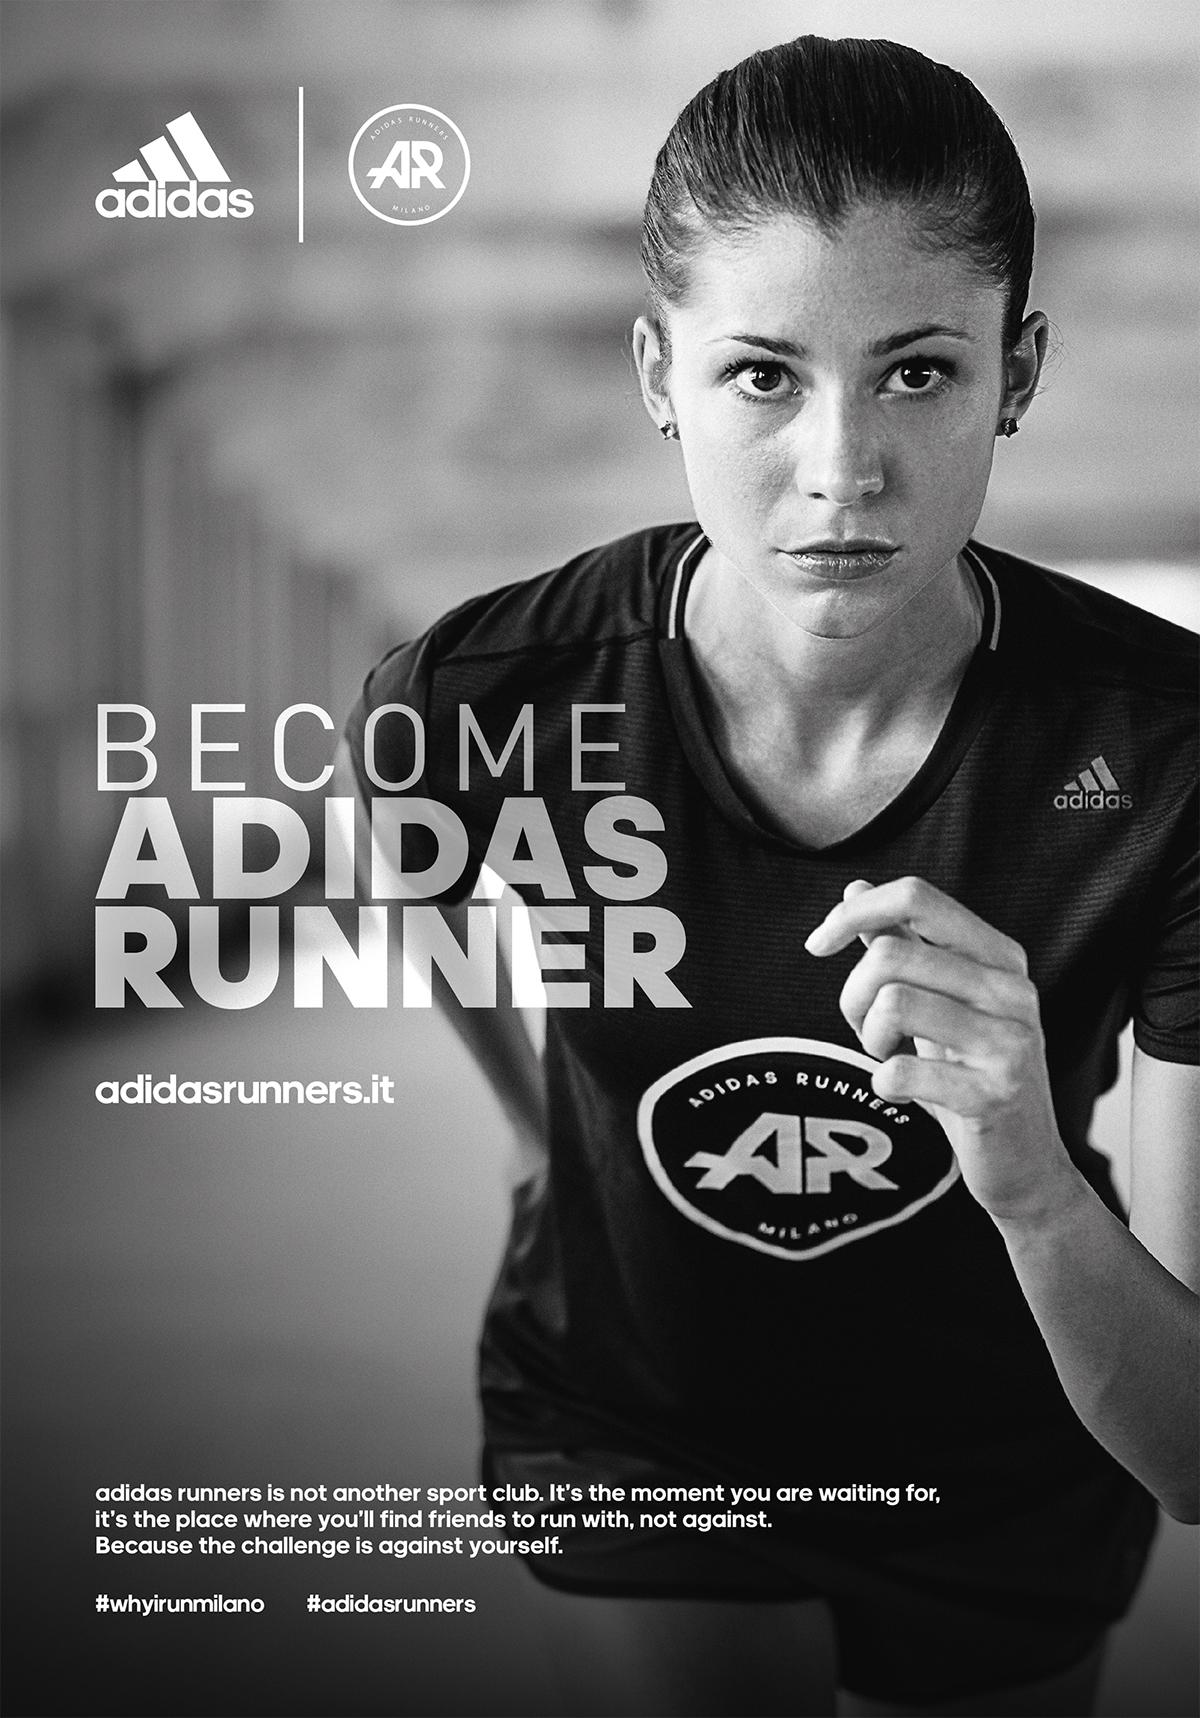 adidas runners club